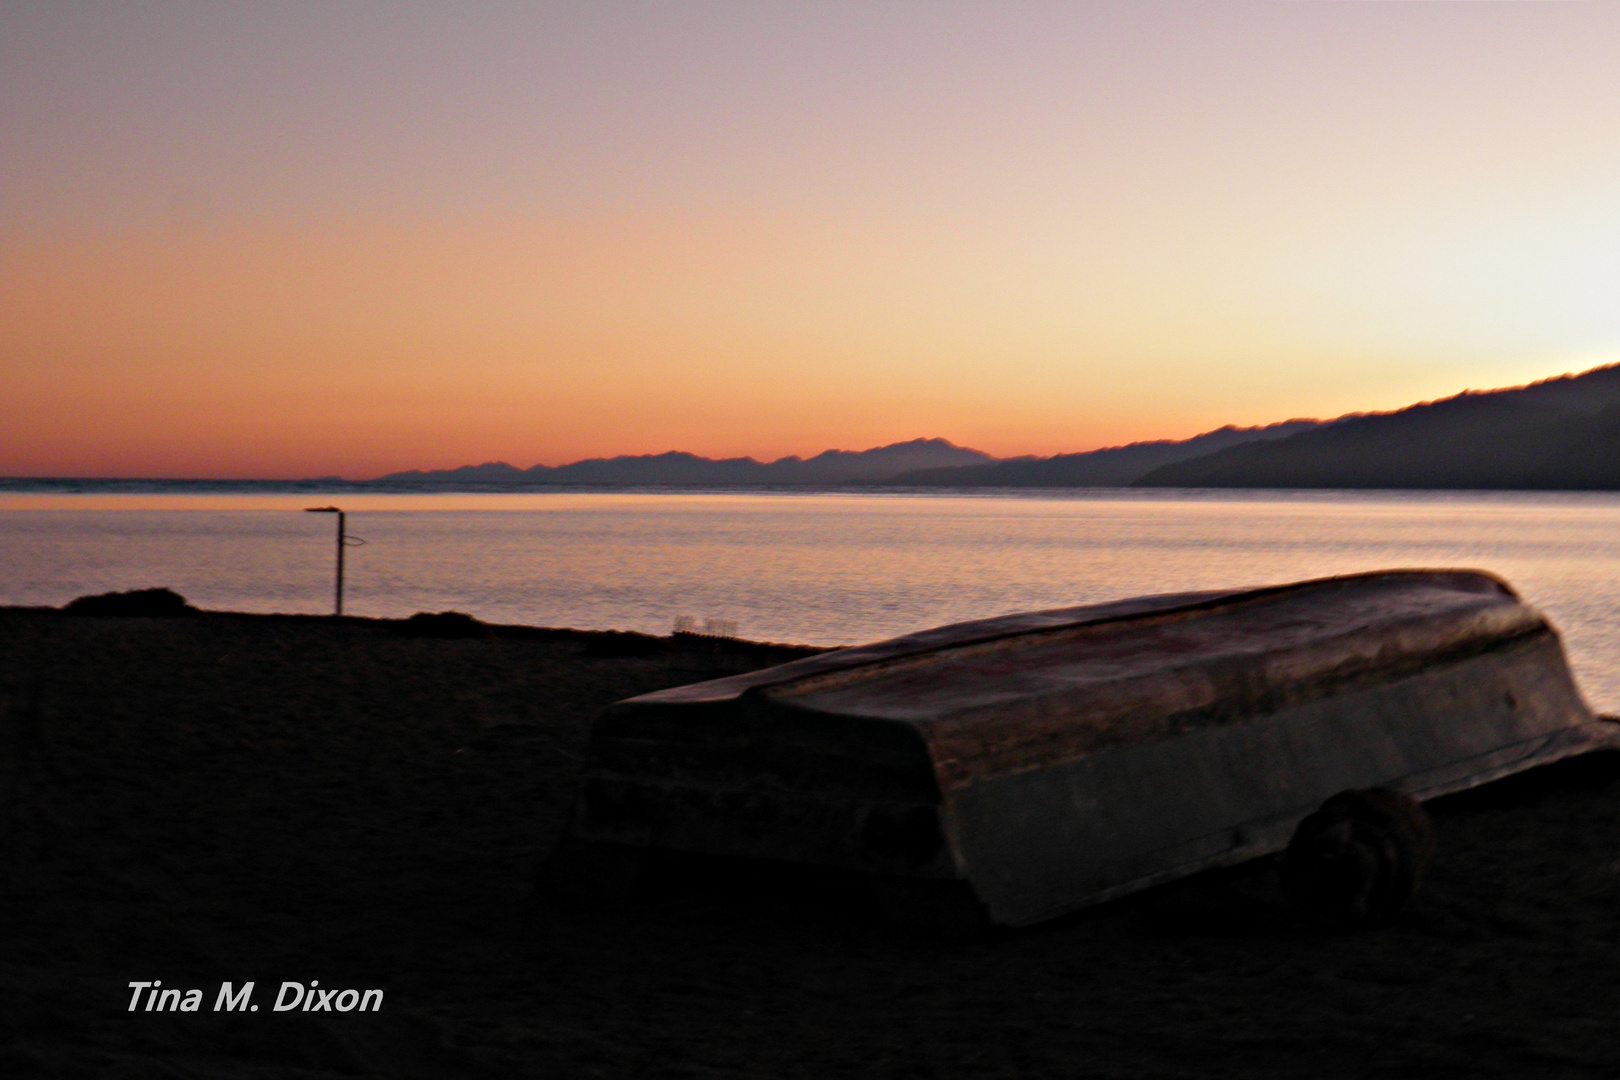 Sunsettime at Lagoona